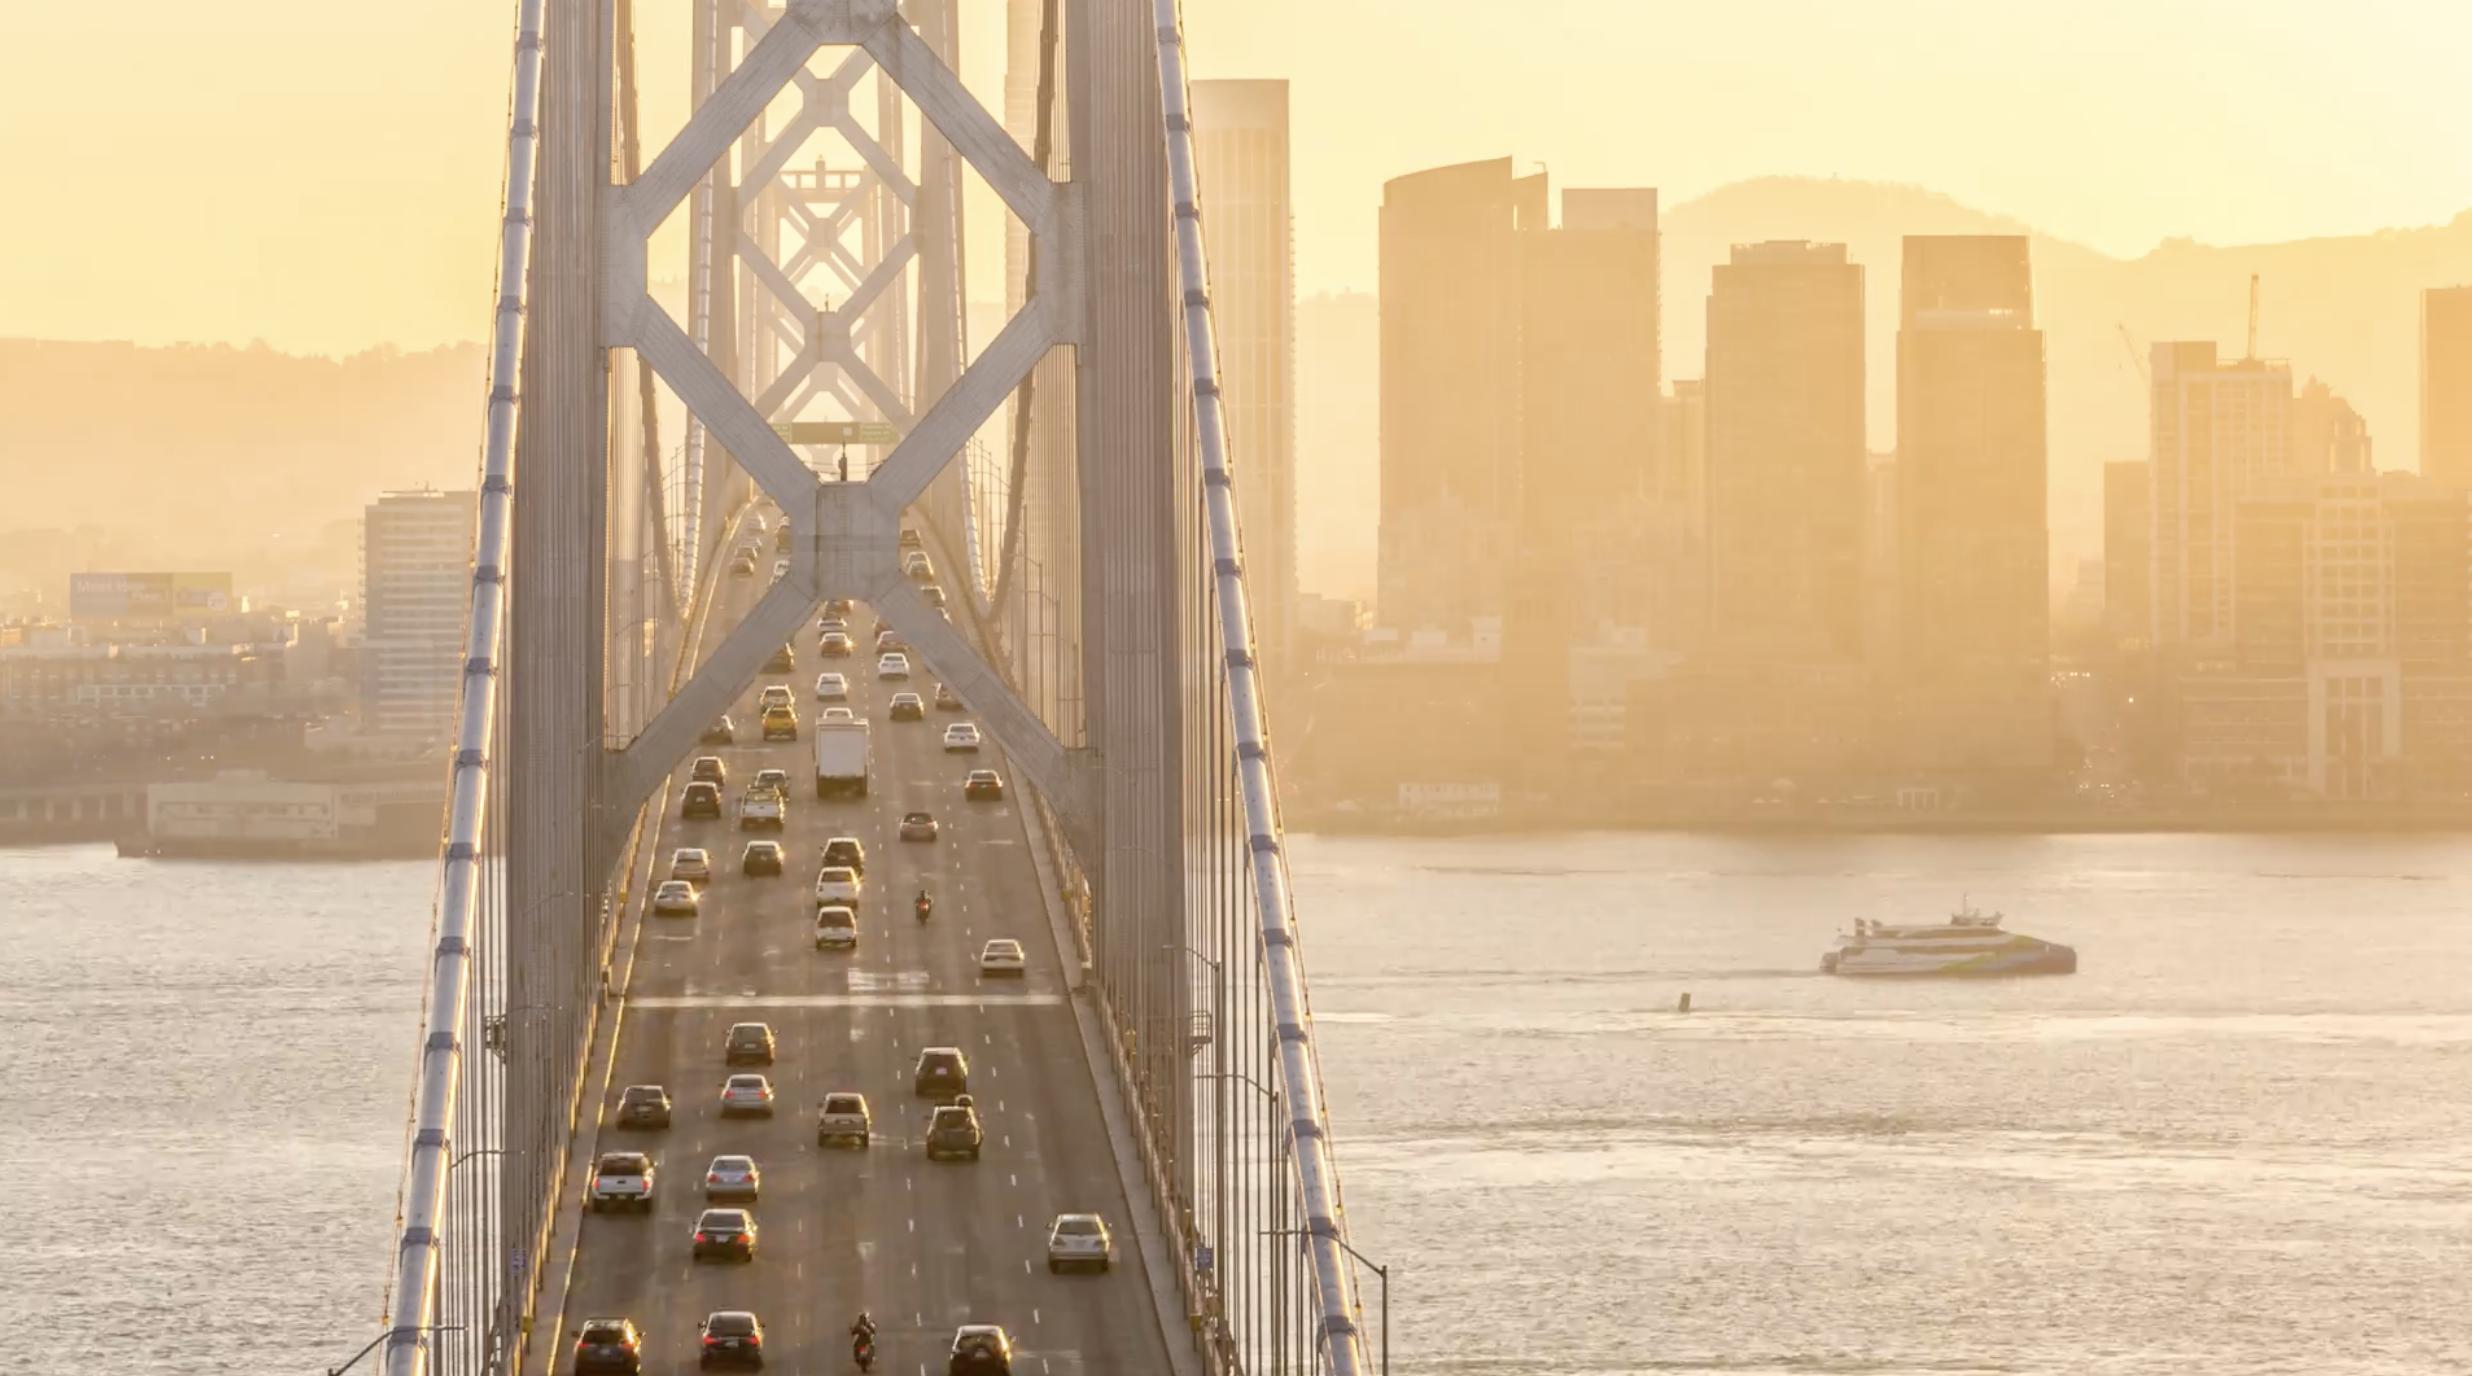 HD) Downtown San Francisco and Bay Bridge at Golden Hour